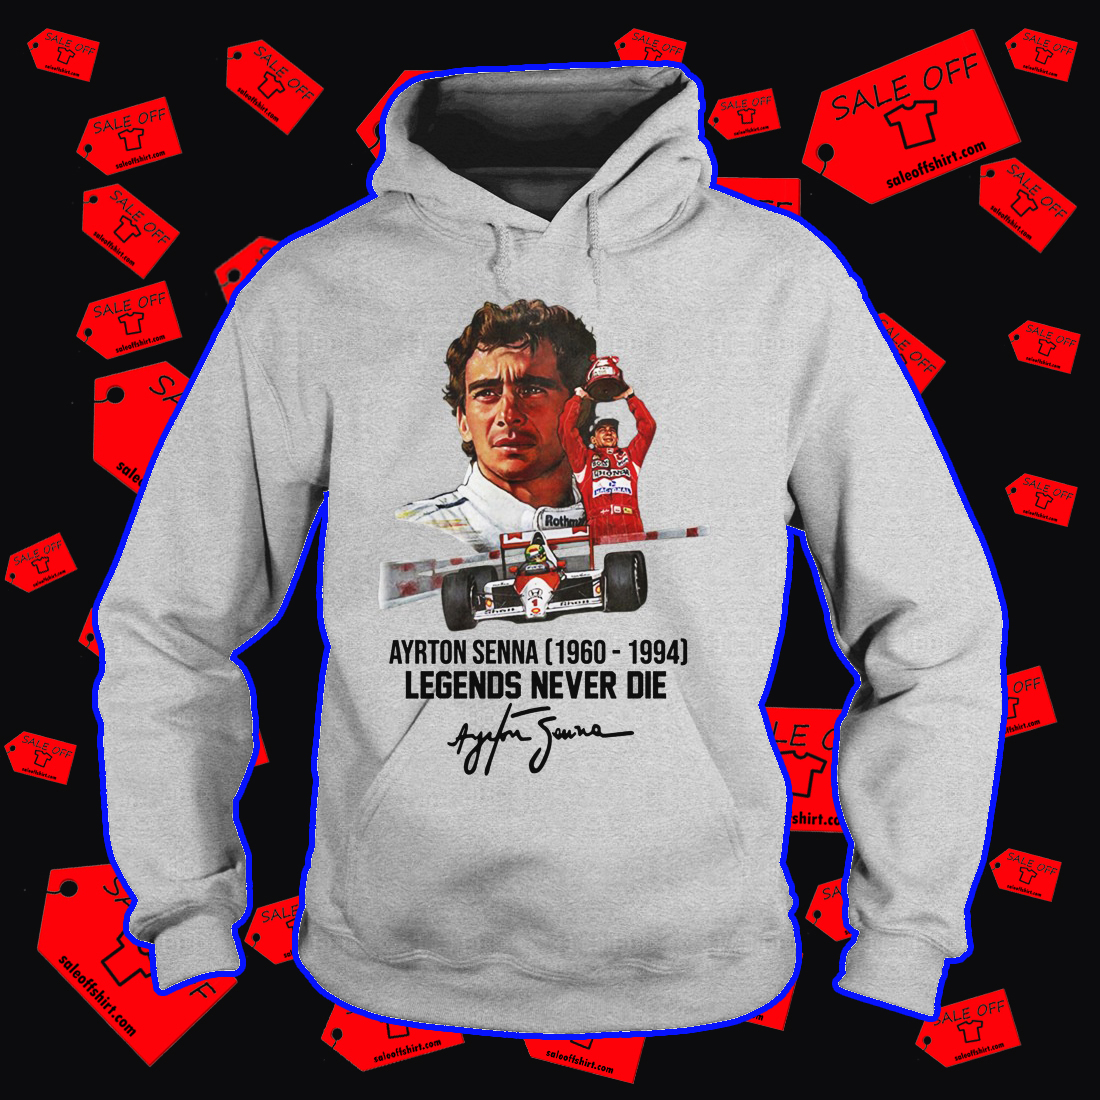 Ayrton Senna legends never die signature hoodie